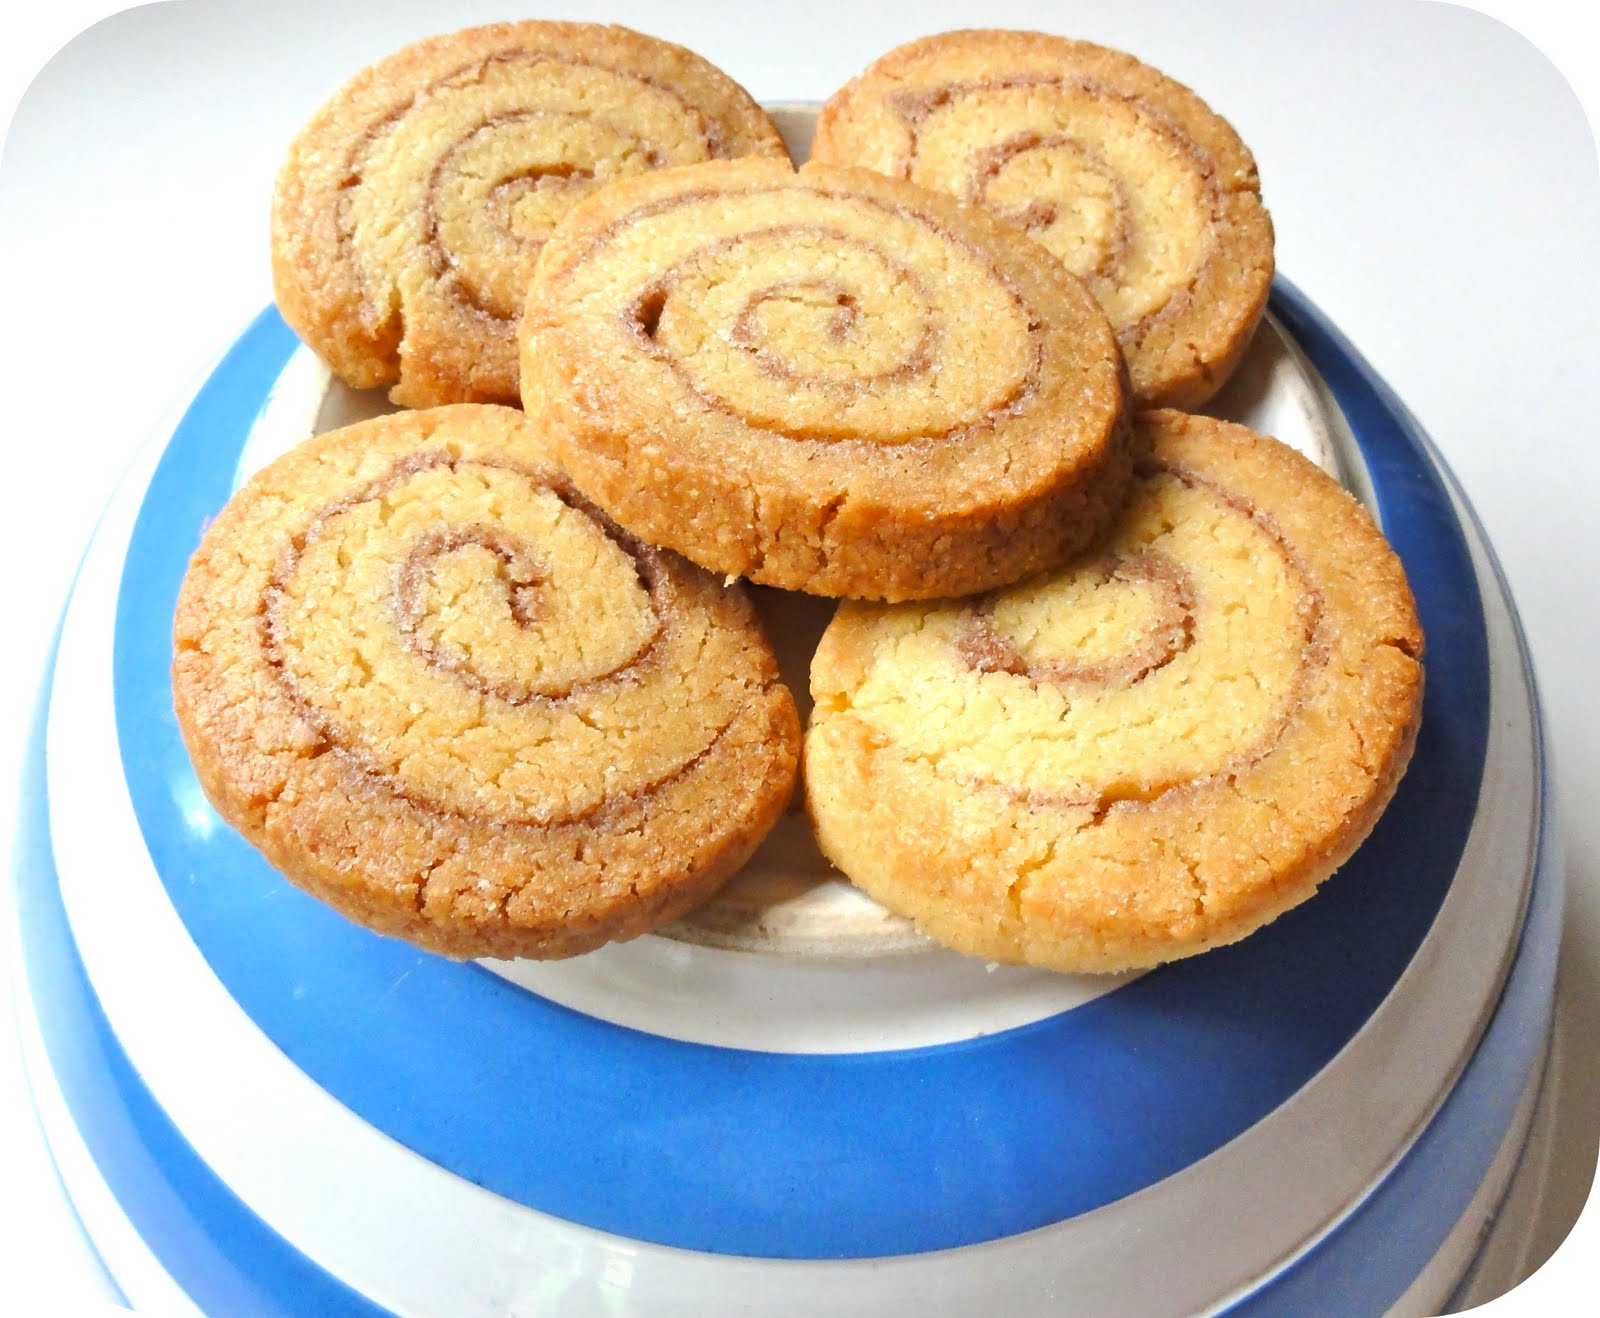 The Procrastobaker: Cinnamon Roll Cookies